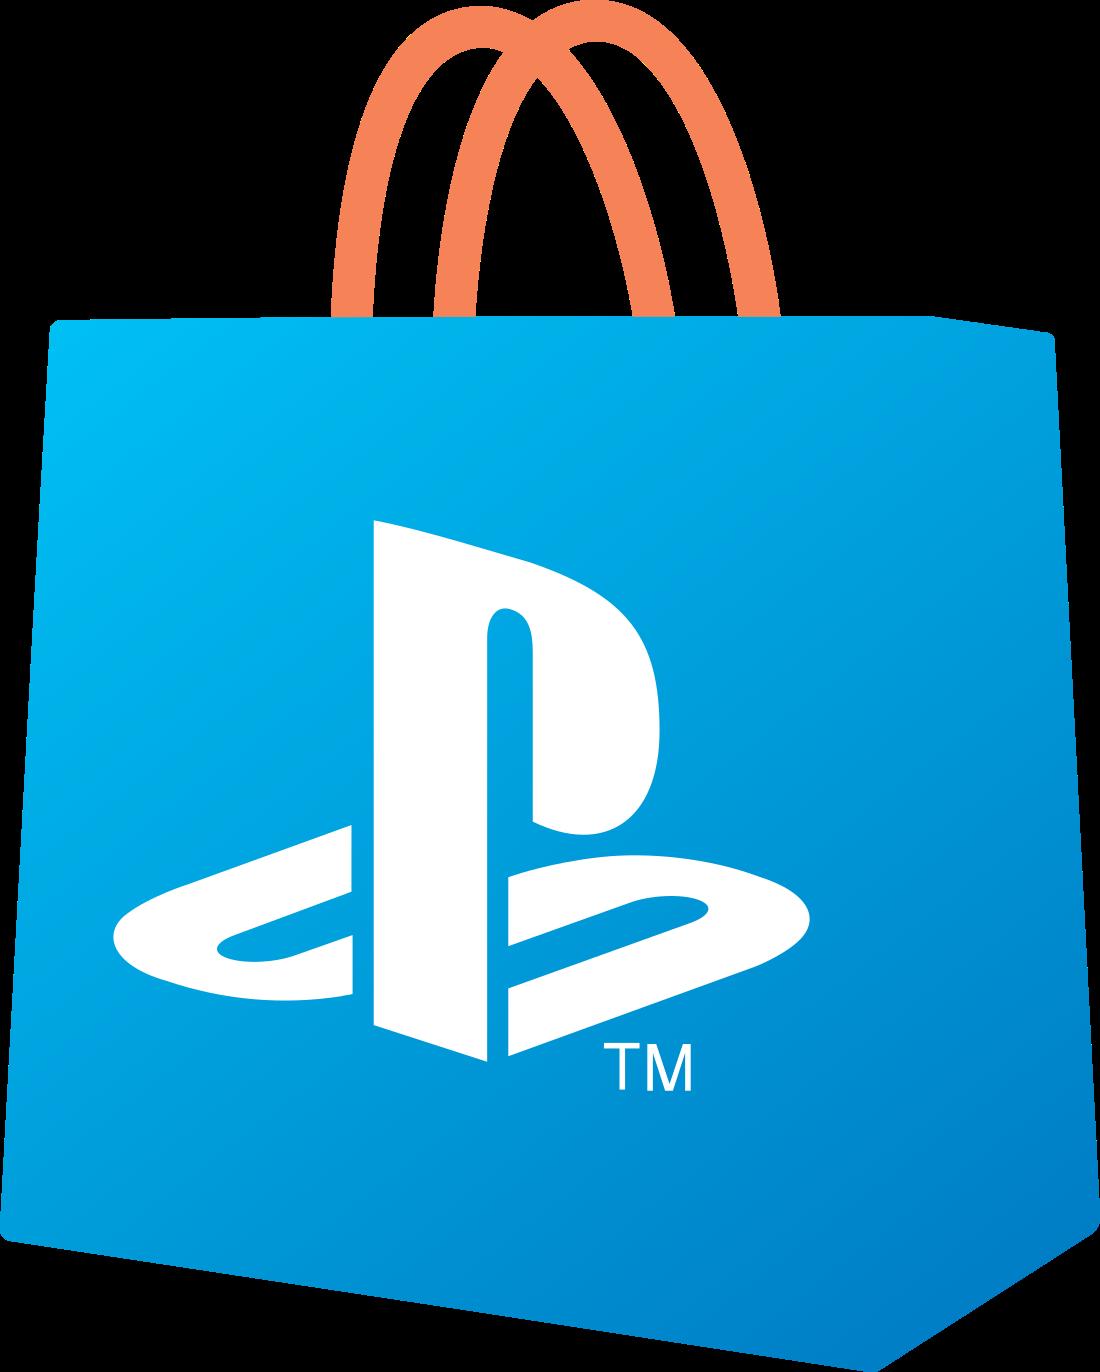 playstation store logo 7 - PlayStation Store Logo